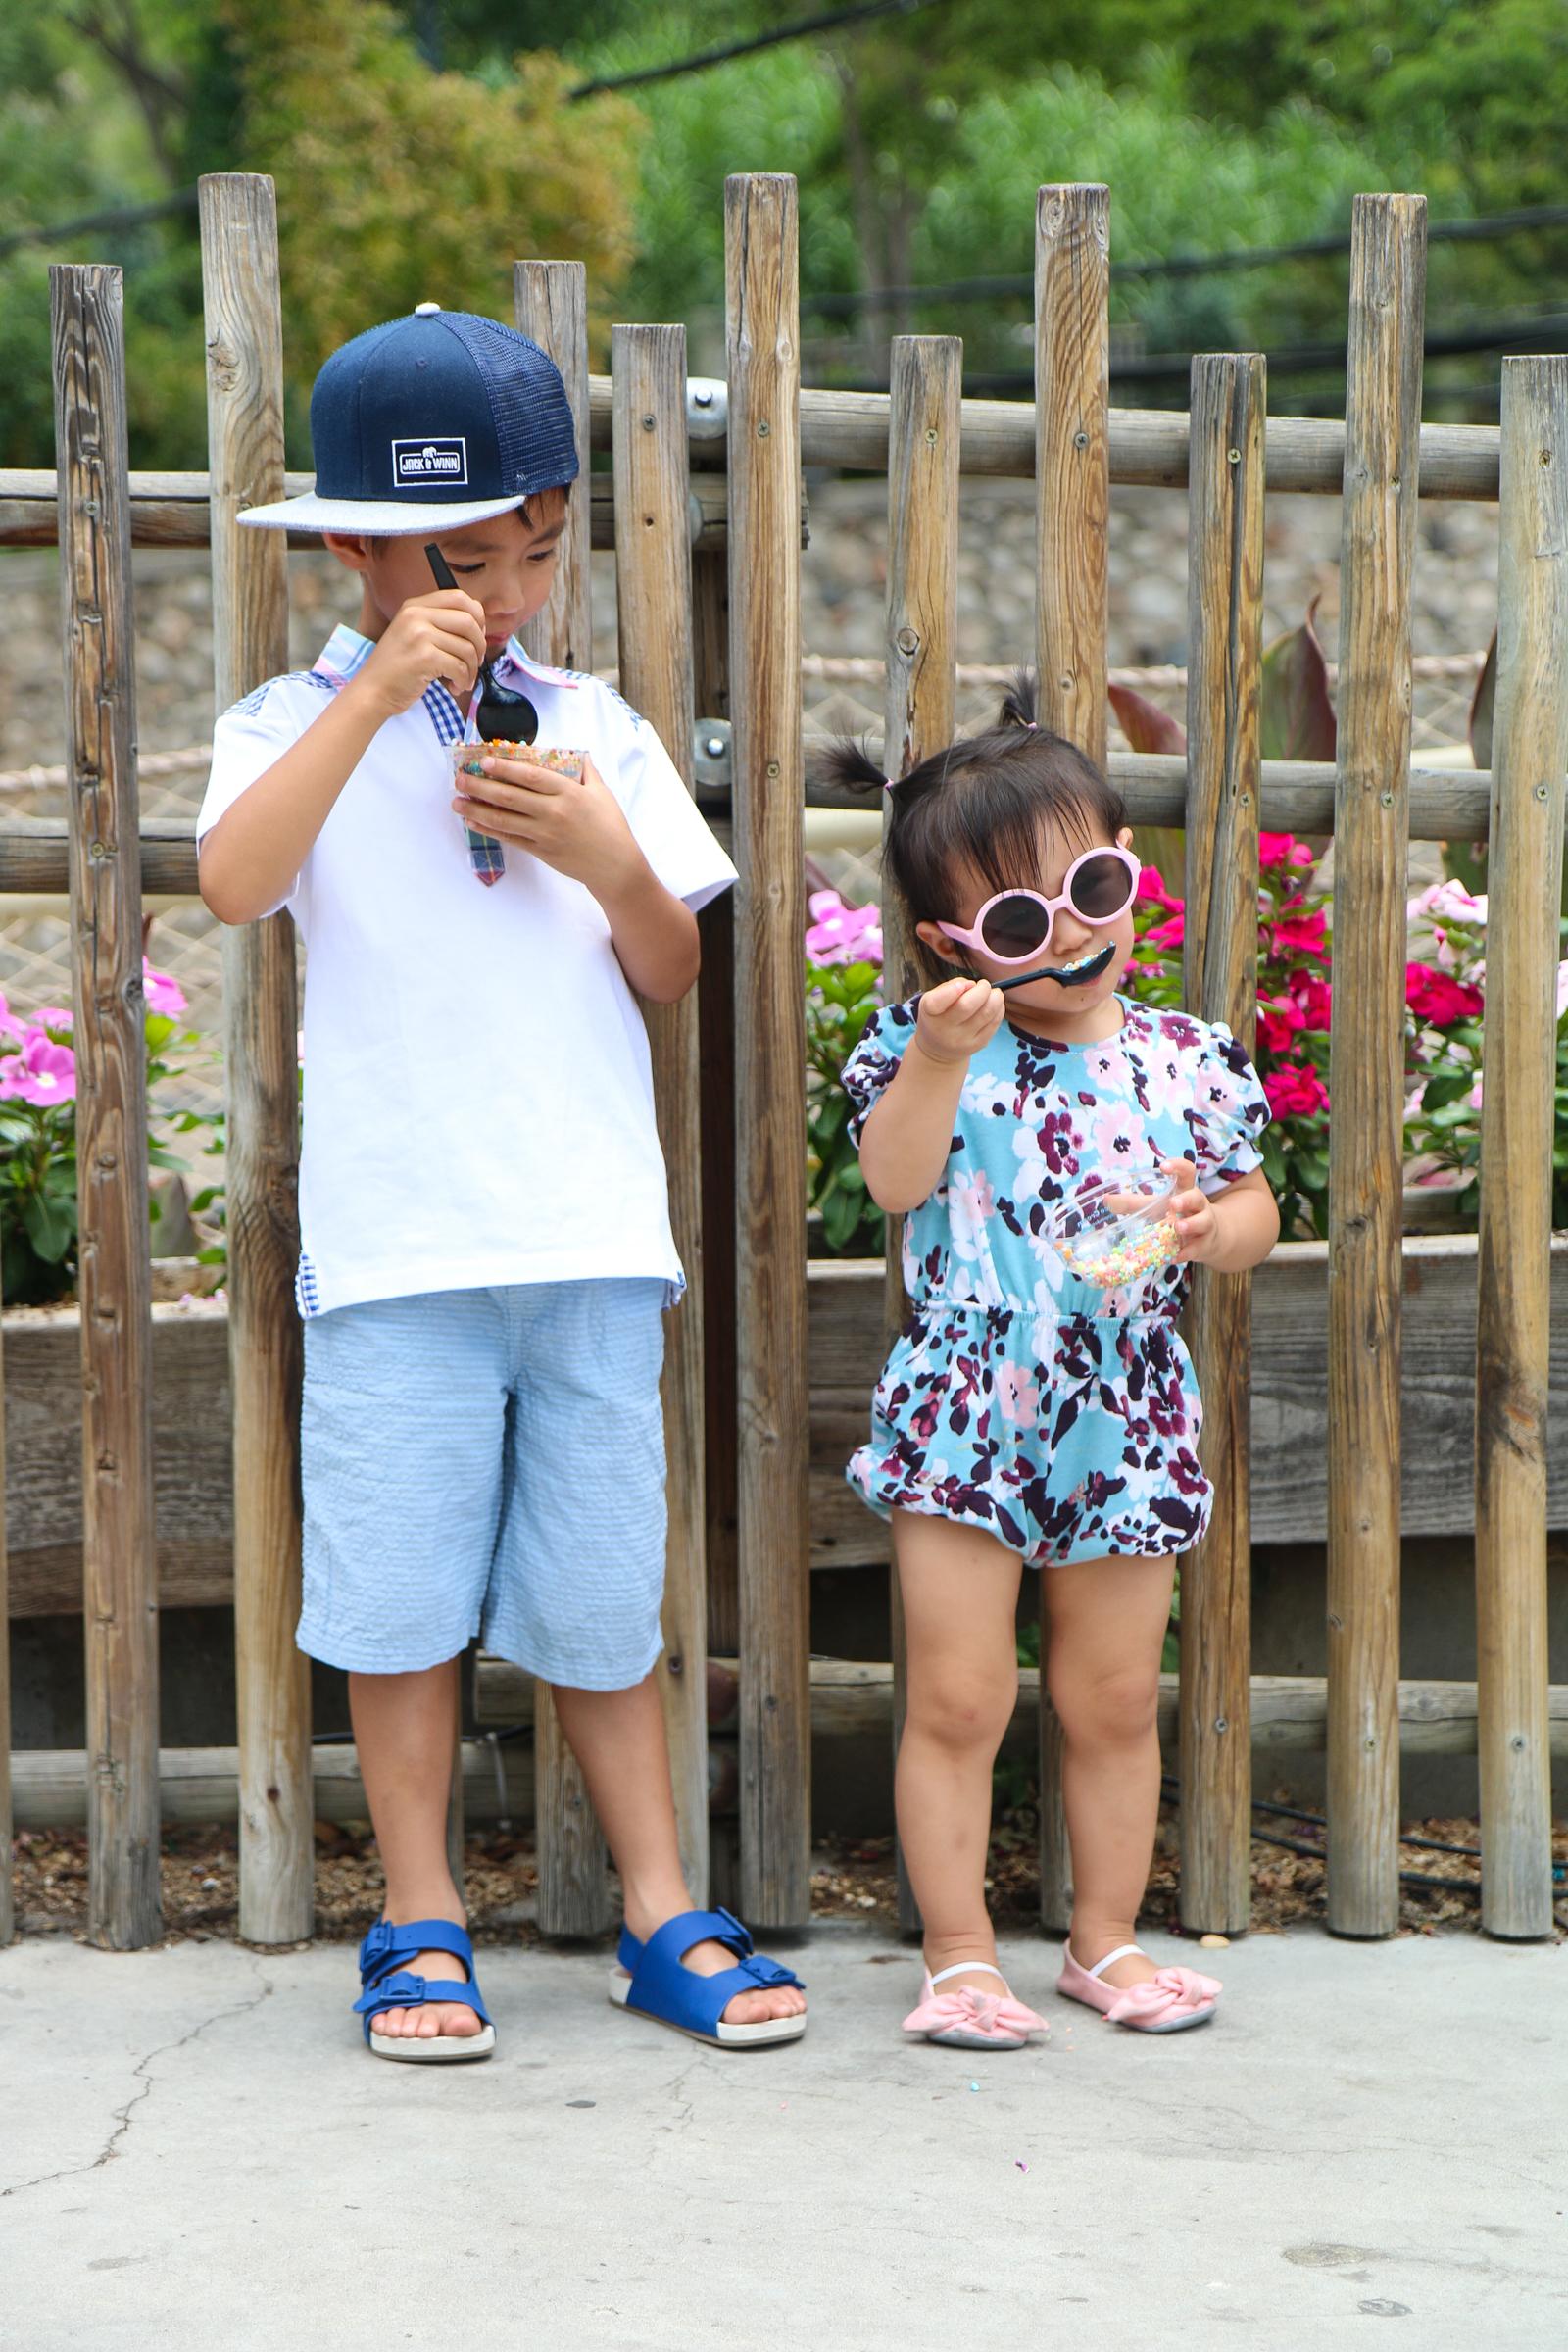 Kids eating Dippin Dots